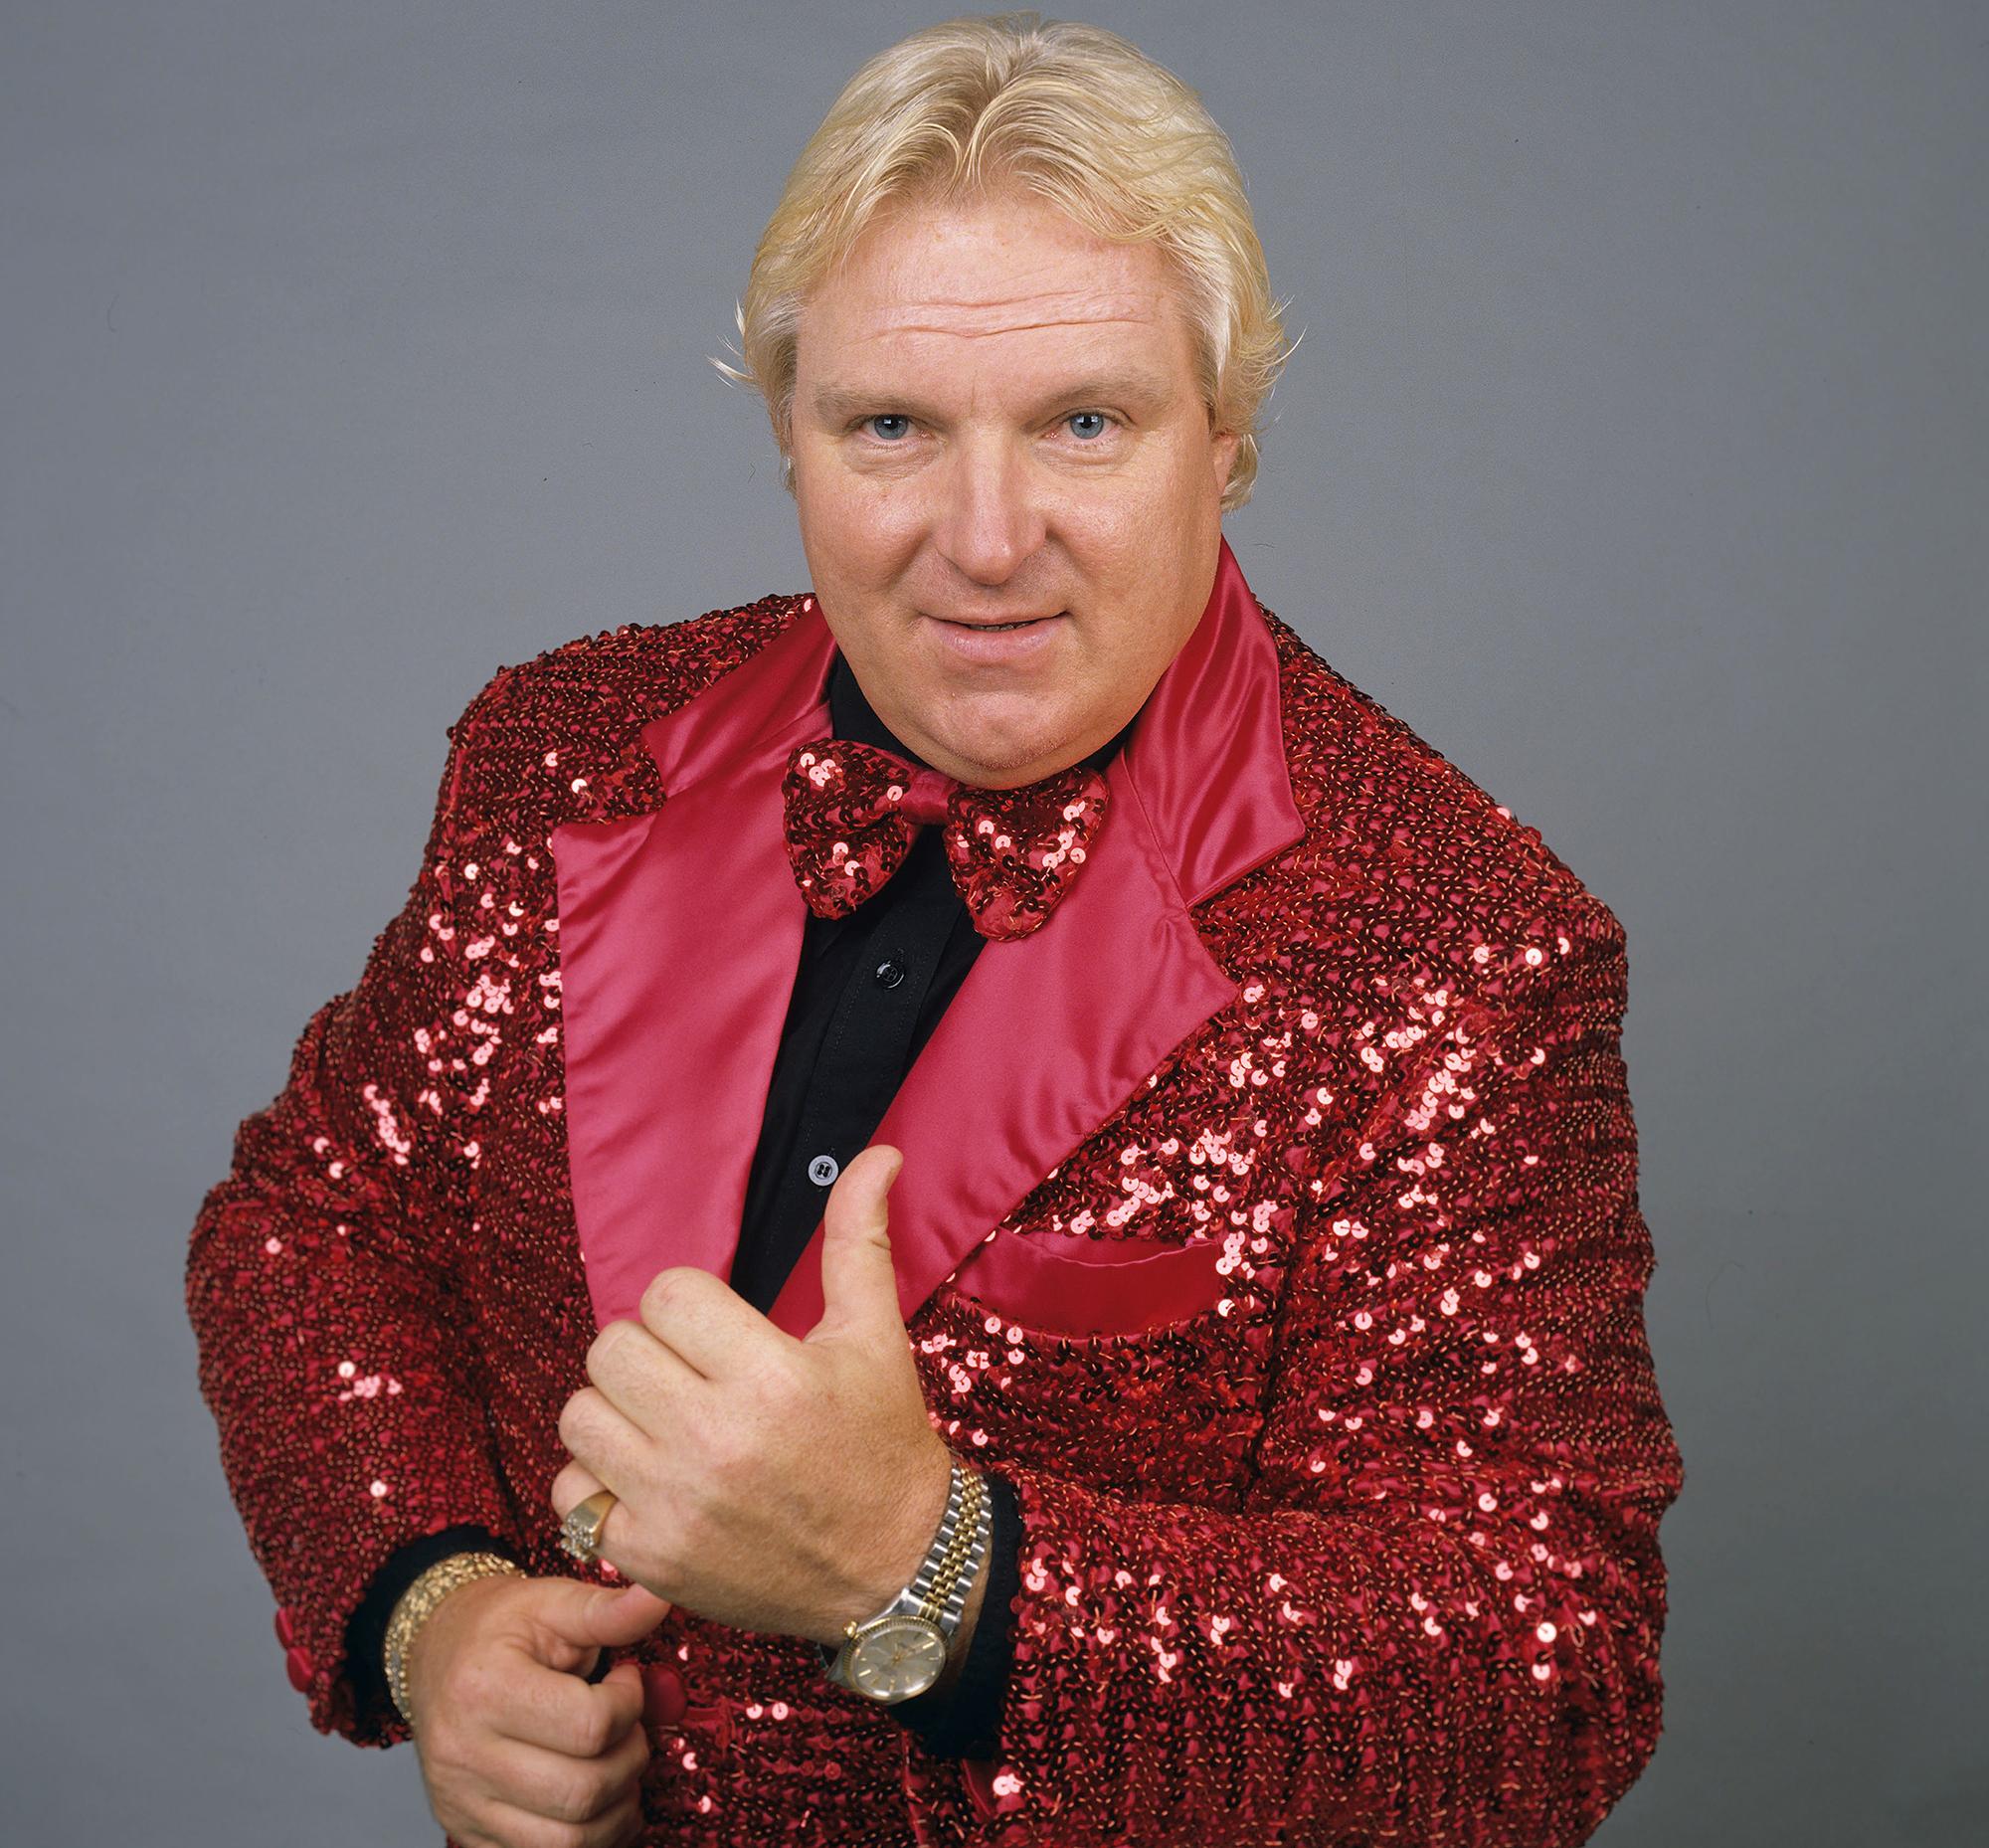 Bobby HeenanCredit: Courtesy WWE